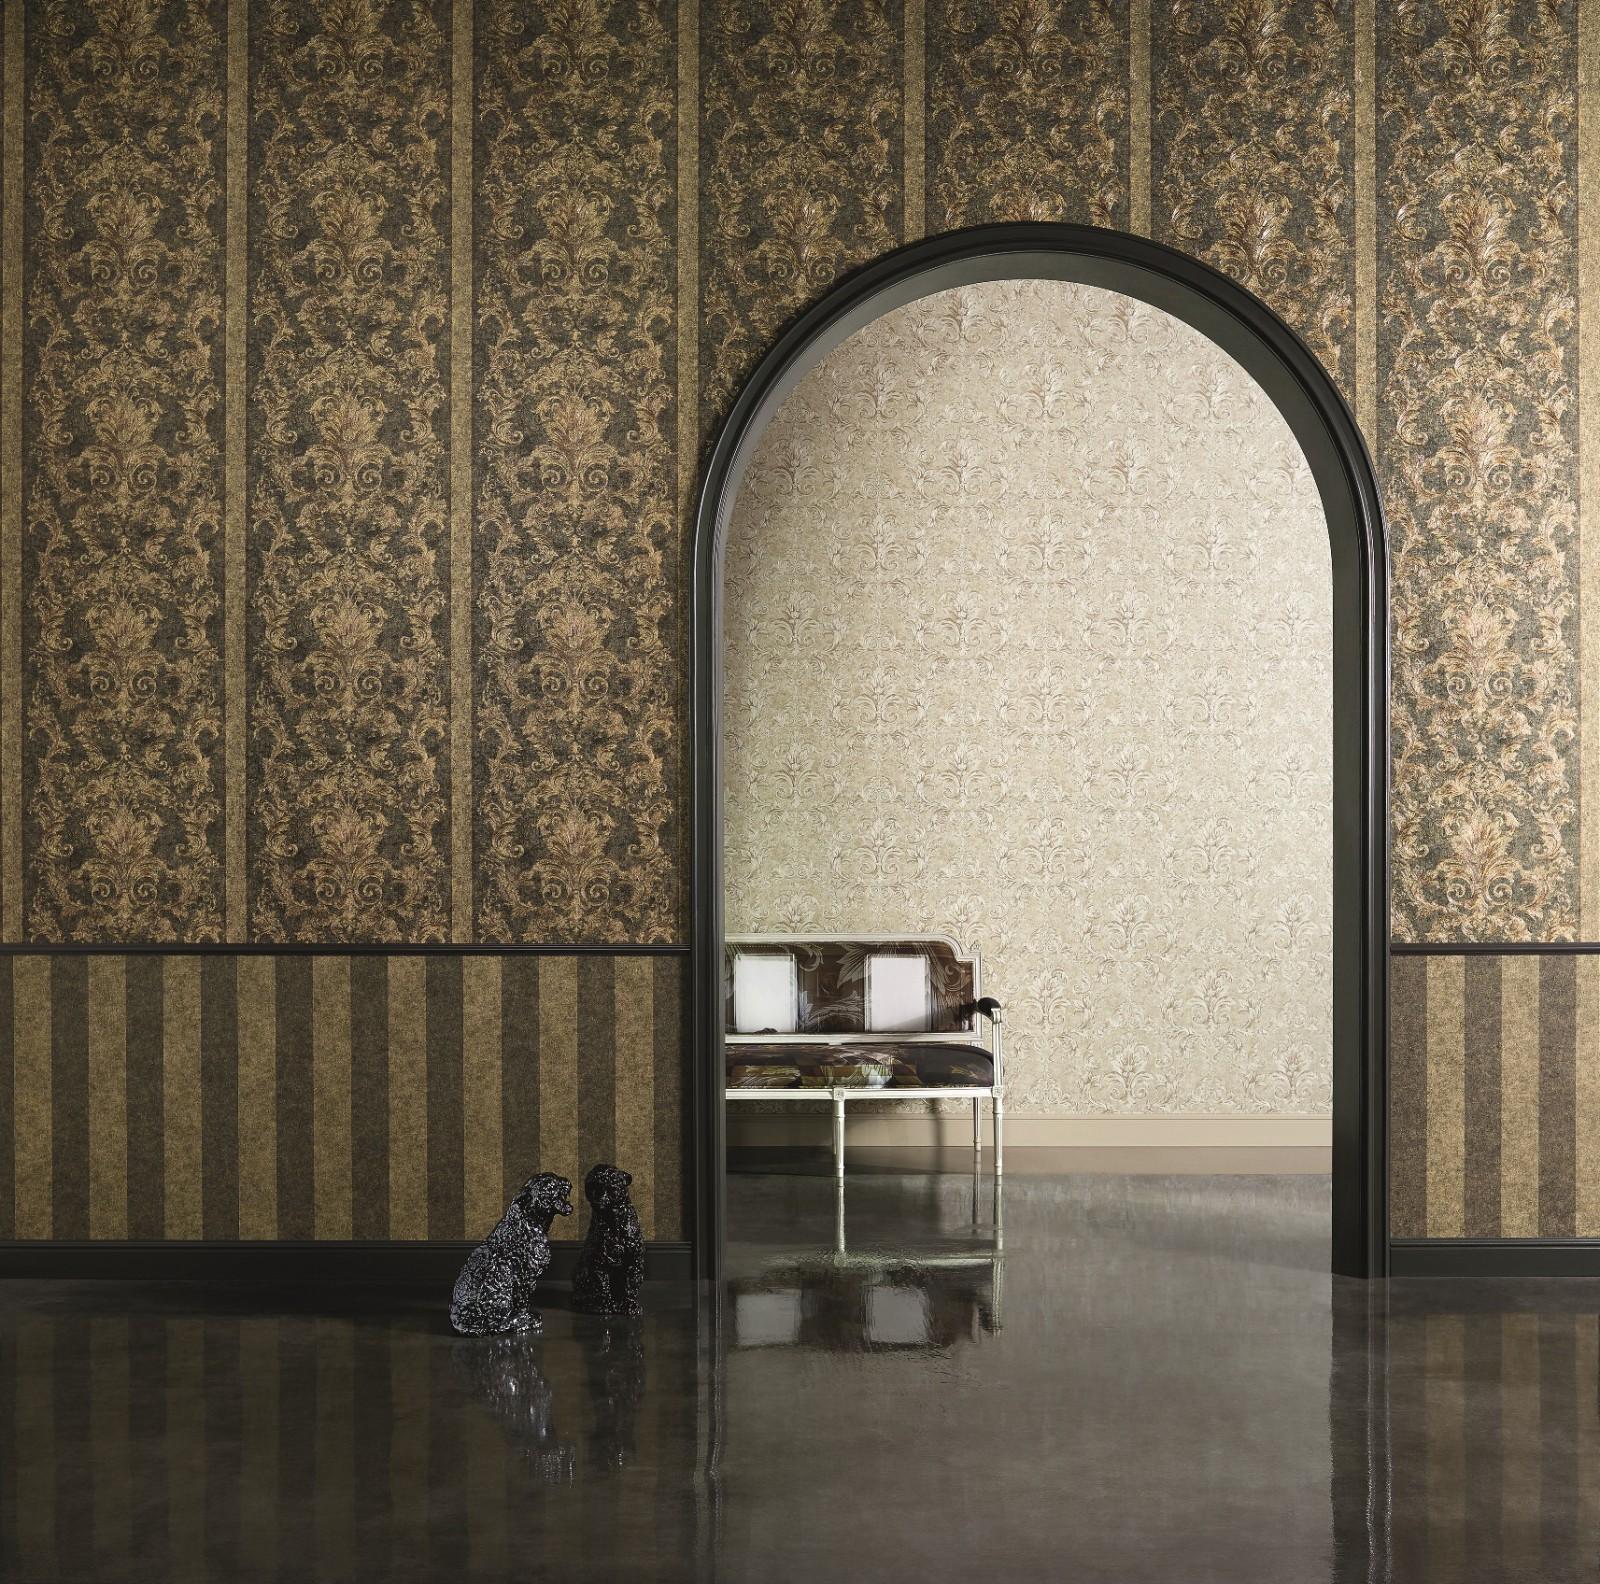 Wallpaper versace ornament brown green 96216 1 for Wallpaper versace home